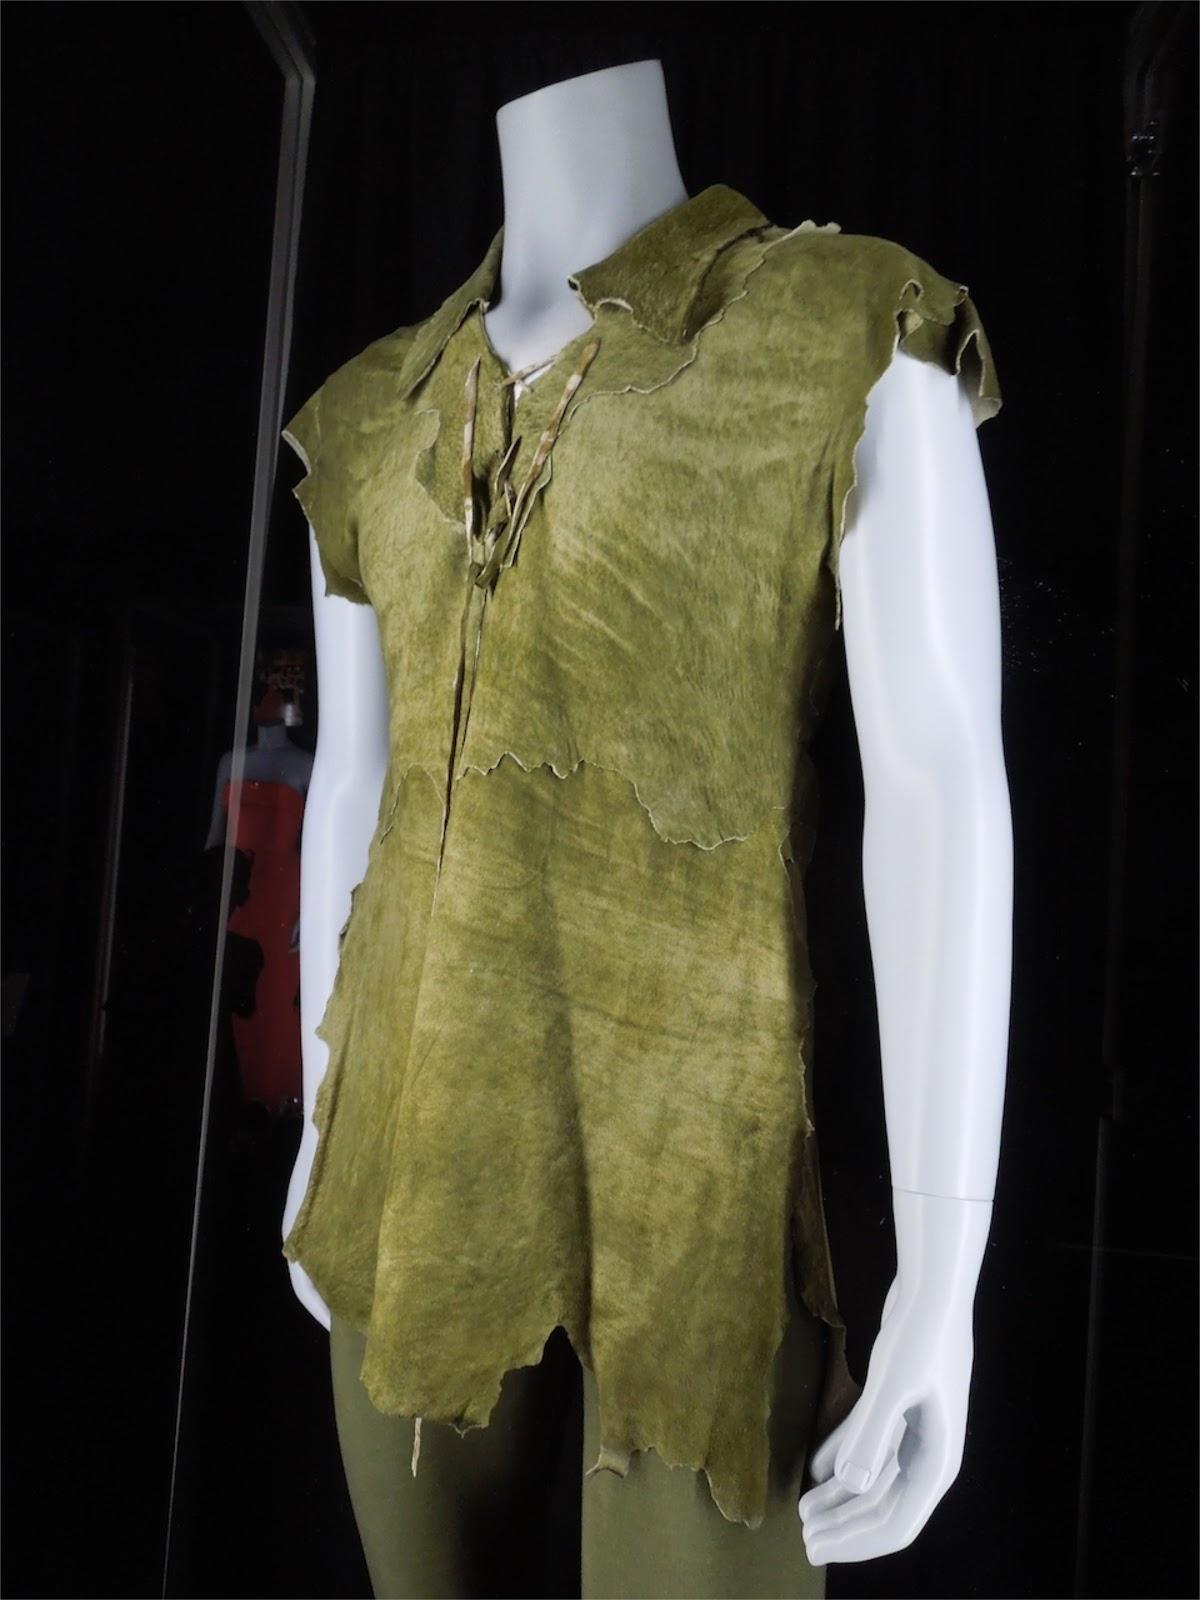 http://1.bp.blogspot.com/-kI_ye2ws2_0/UOsiBAv6rwI/AAAAAAAA9ok/p2sJfKNg7xs/s1600/Baryshnikov+Peter+Pan+costume.jpg